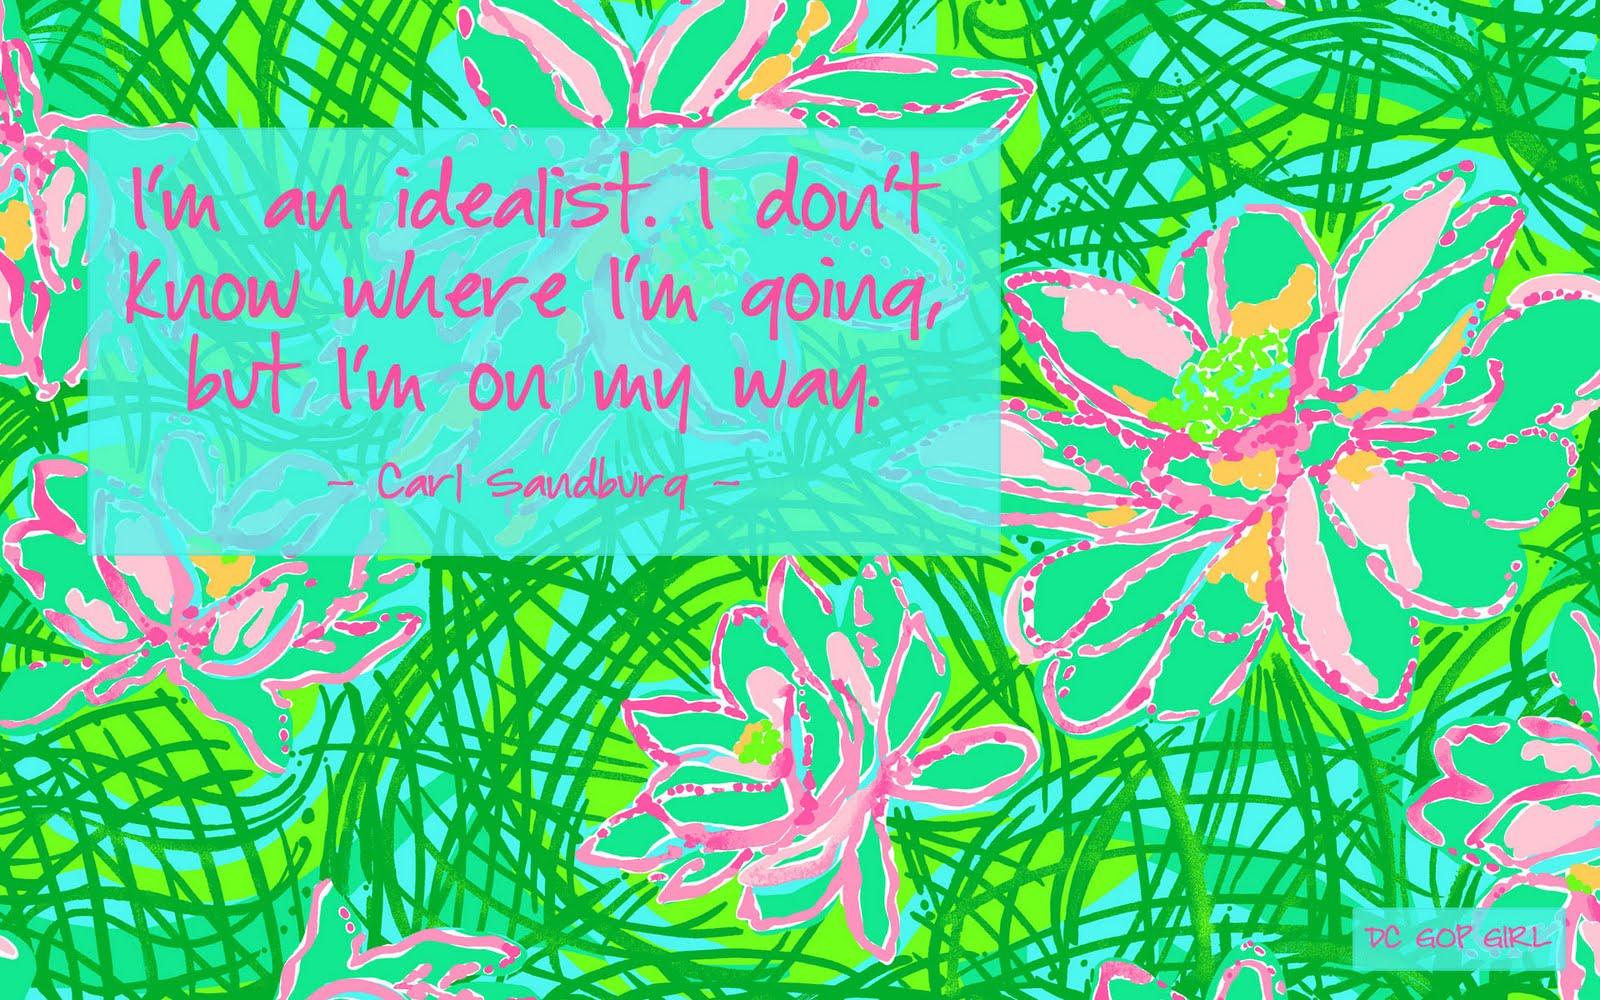 Lilly Pulitzer Quotes | Wallpaper Lilly Pulitzer Wallpapersafari